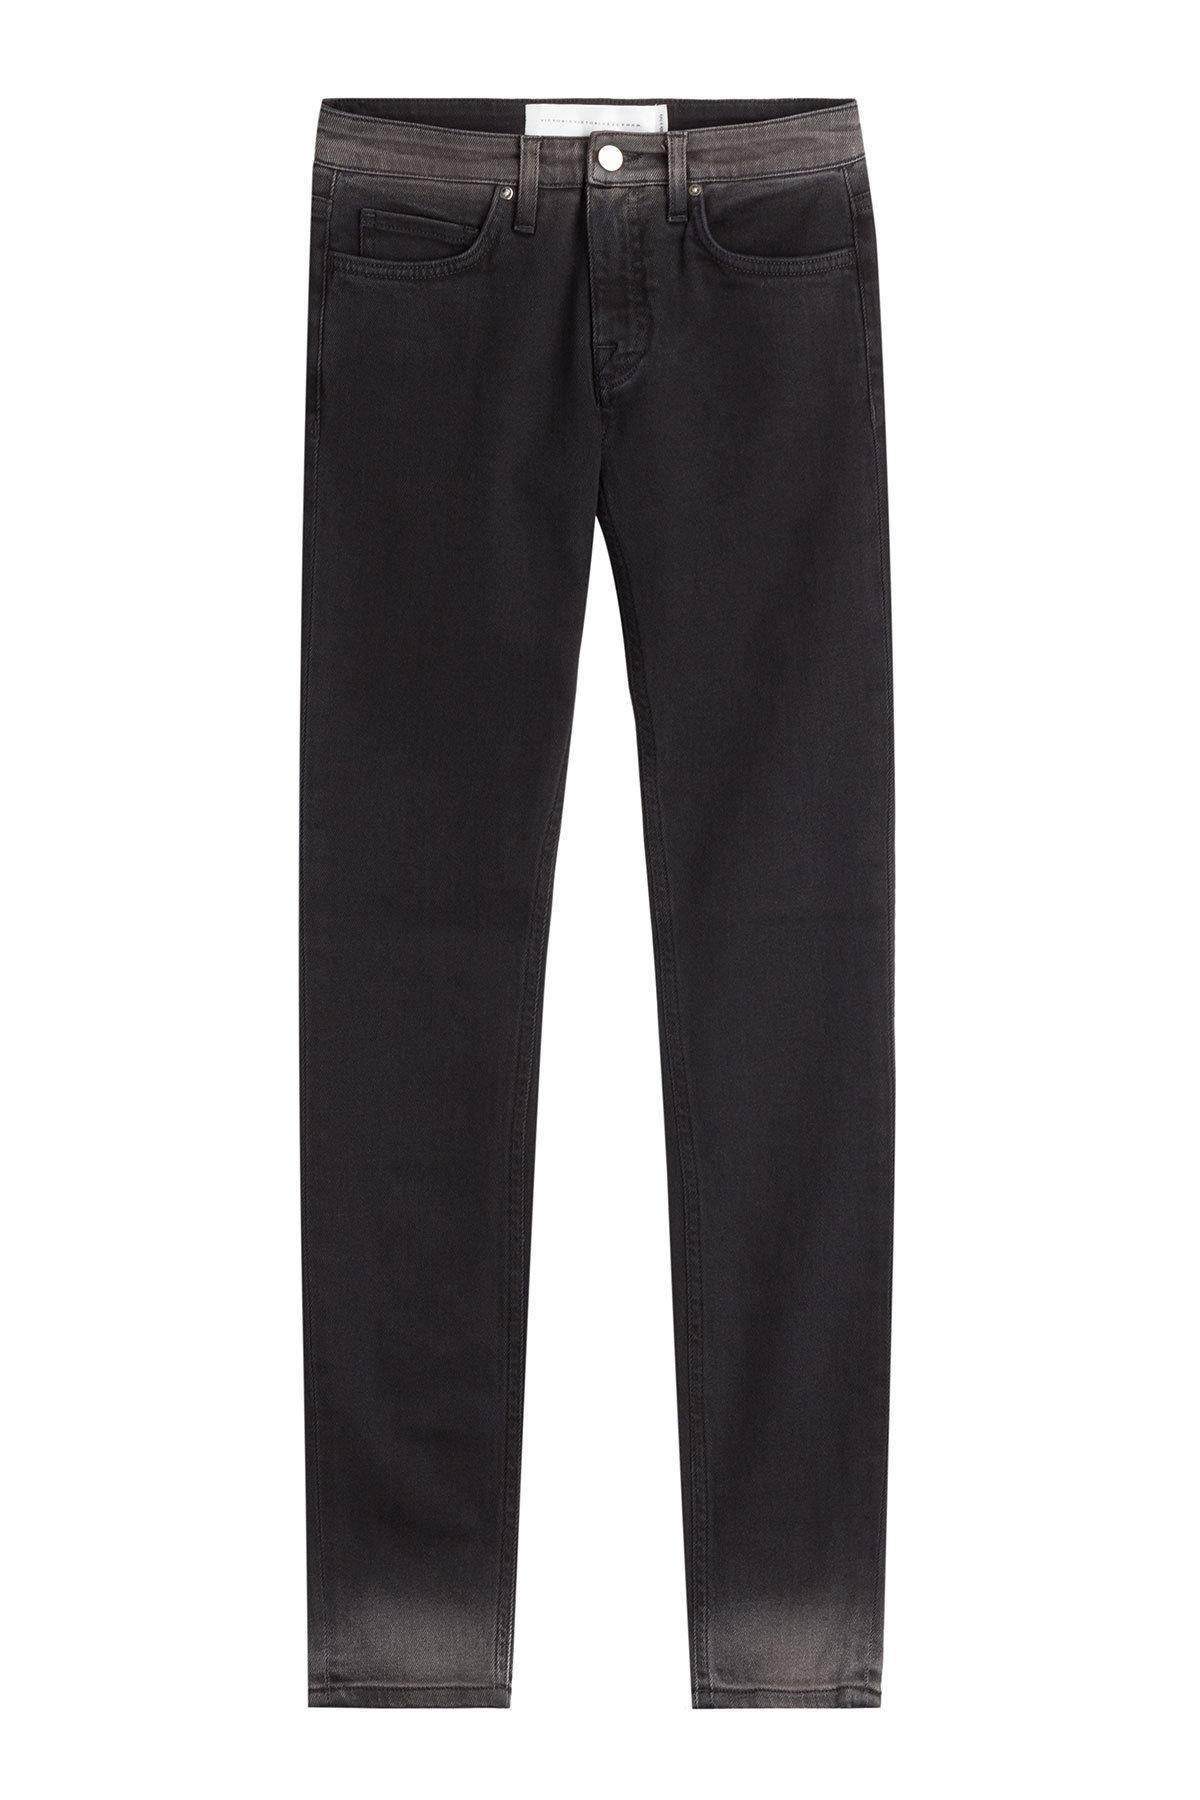 victoria_beckham_skinny_jeans.jpg